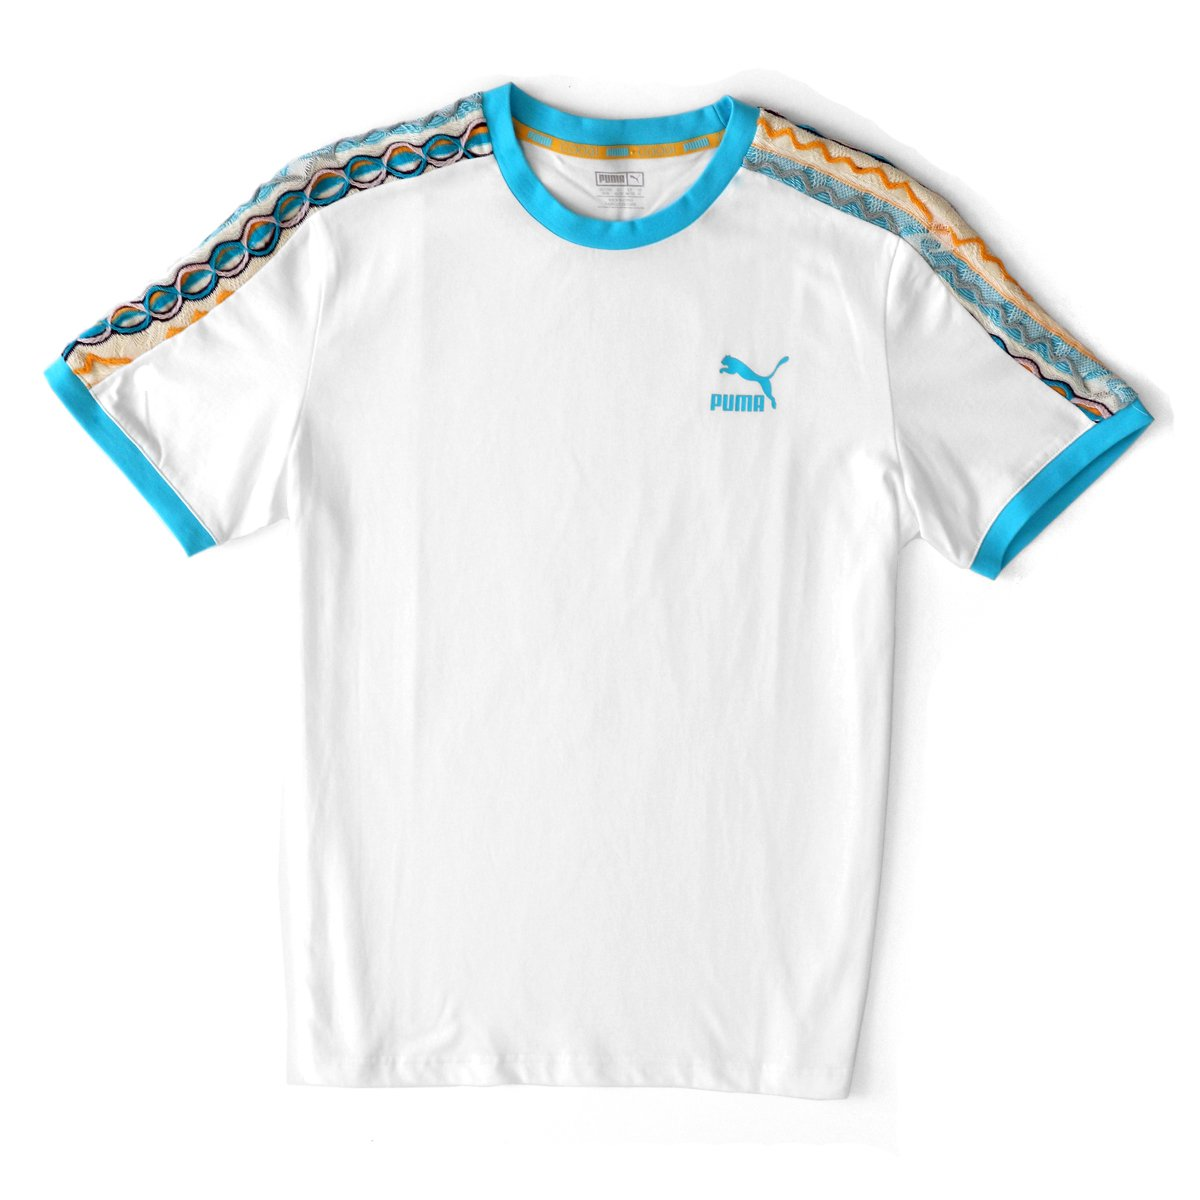 Archive — T Puma On SaleCoogi X Shirt Shouts Sneaker nwvm80N